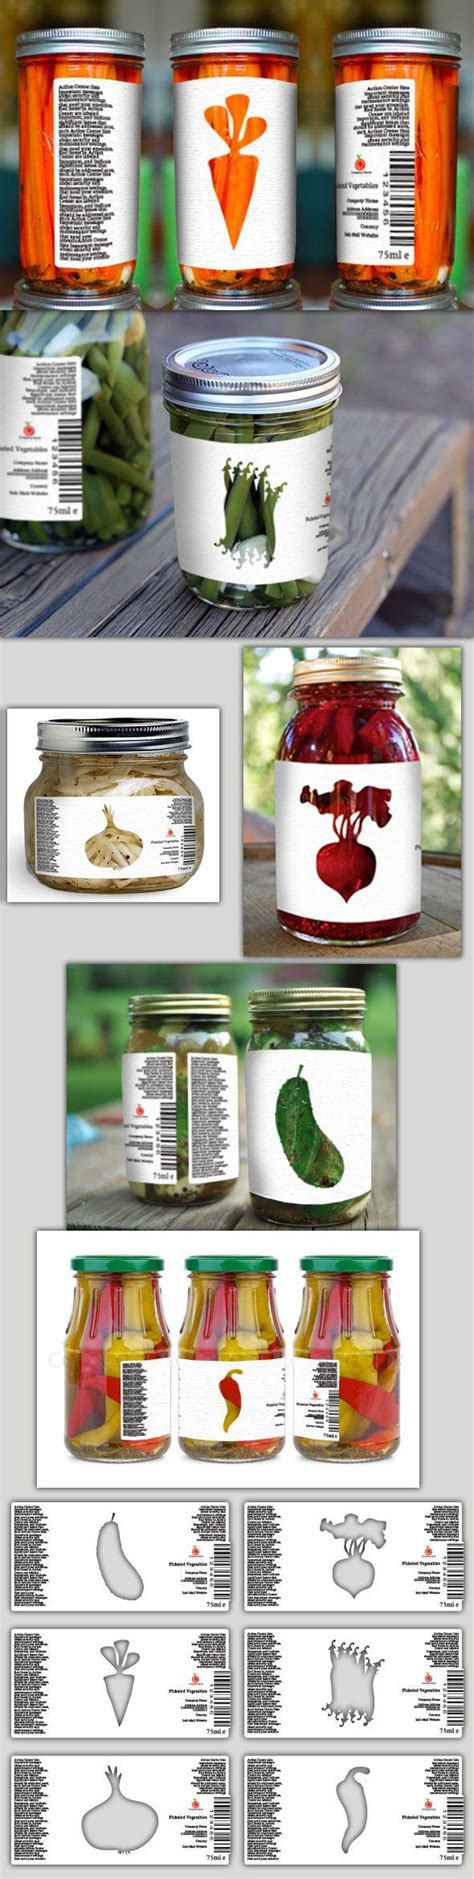 label design nyc 16 best packaging design images on pinterest packaging